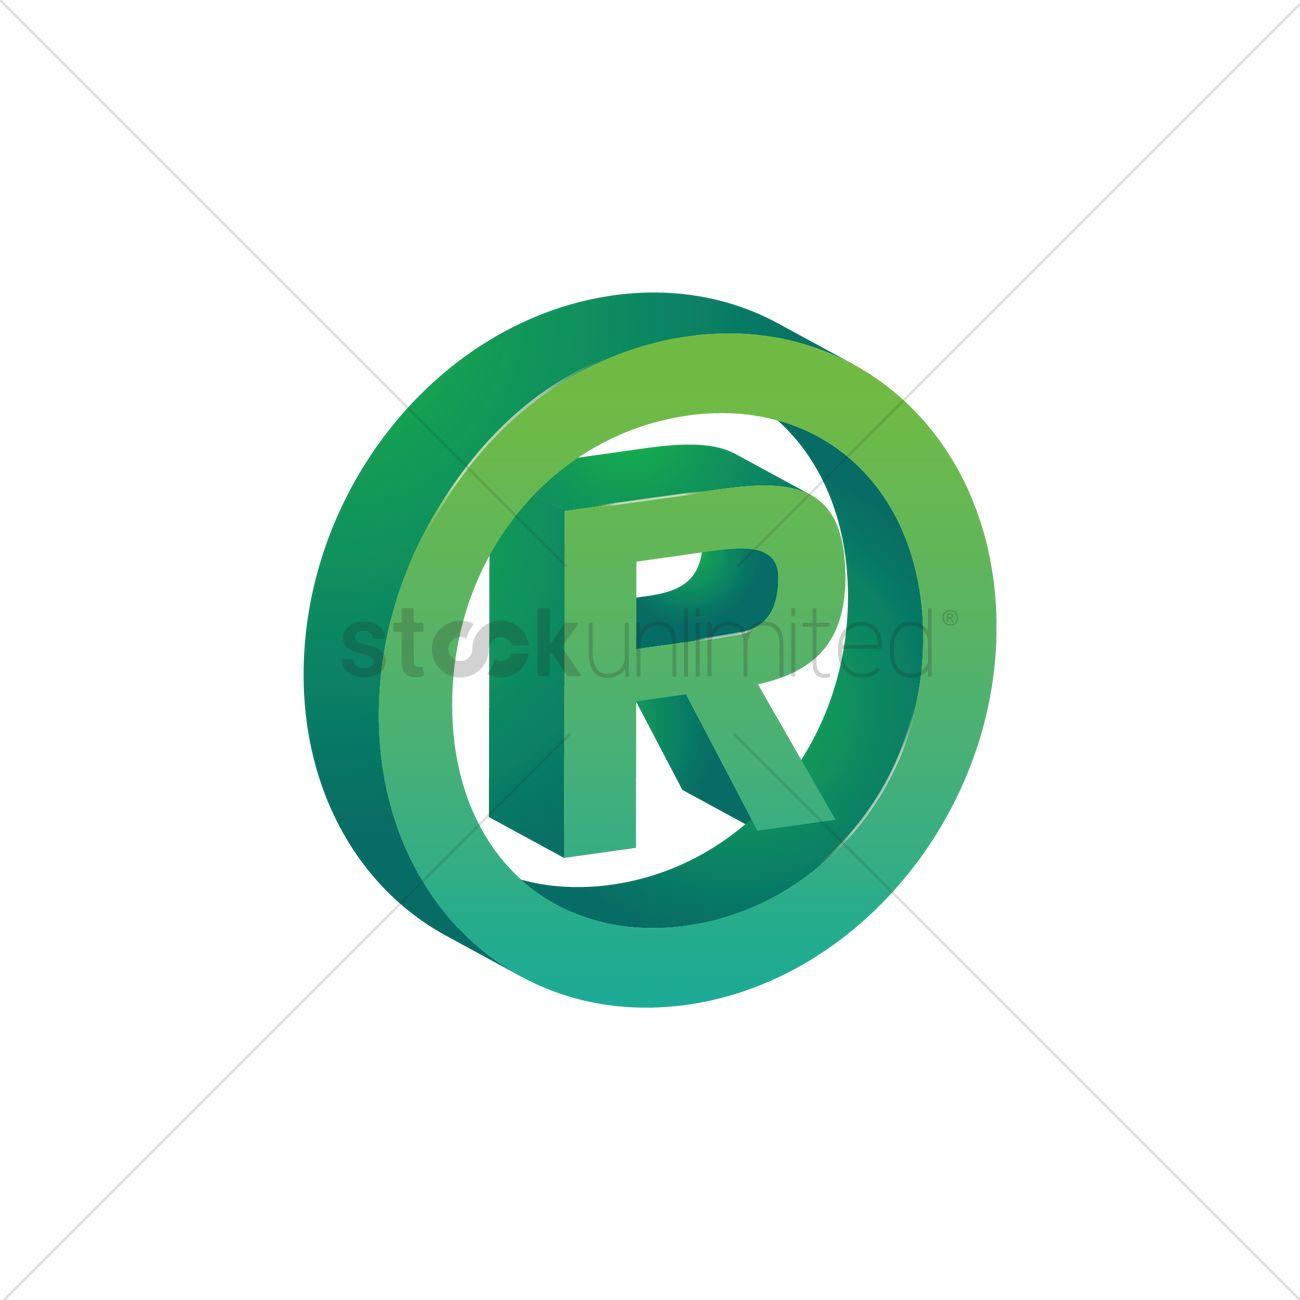 registered trademark symbol vector graphic